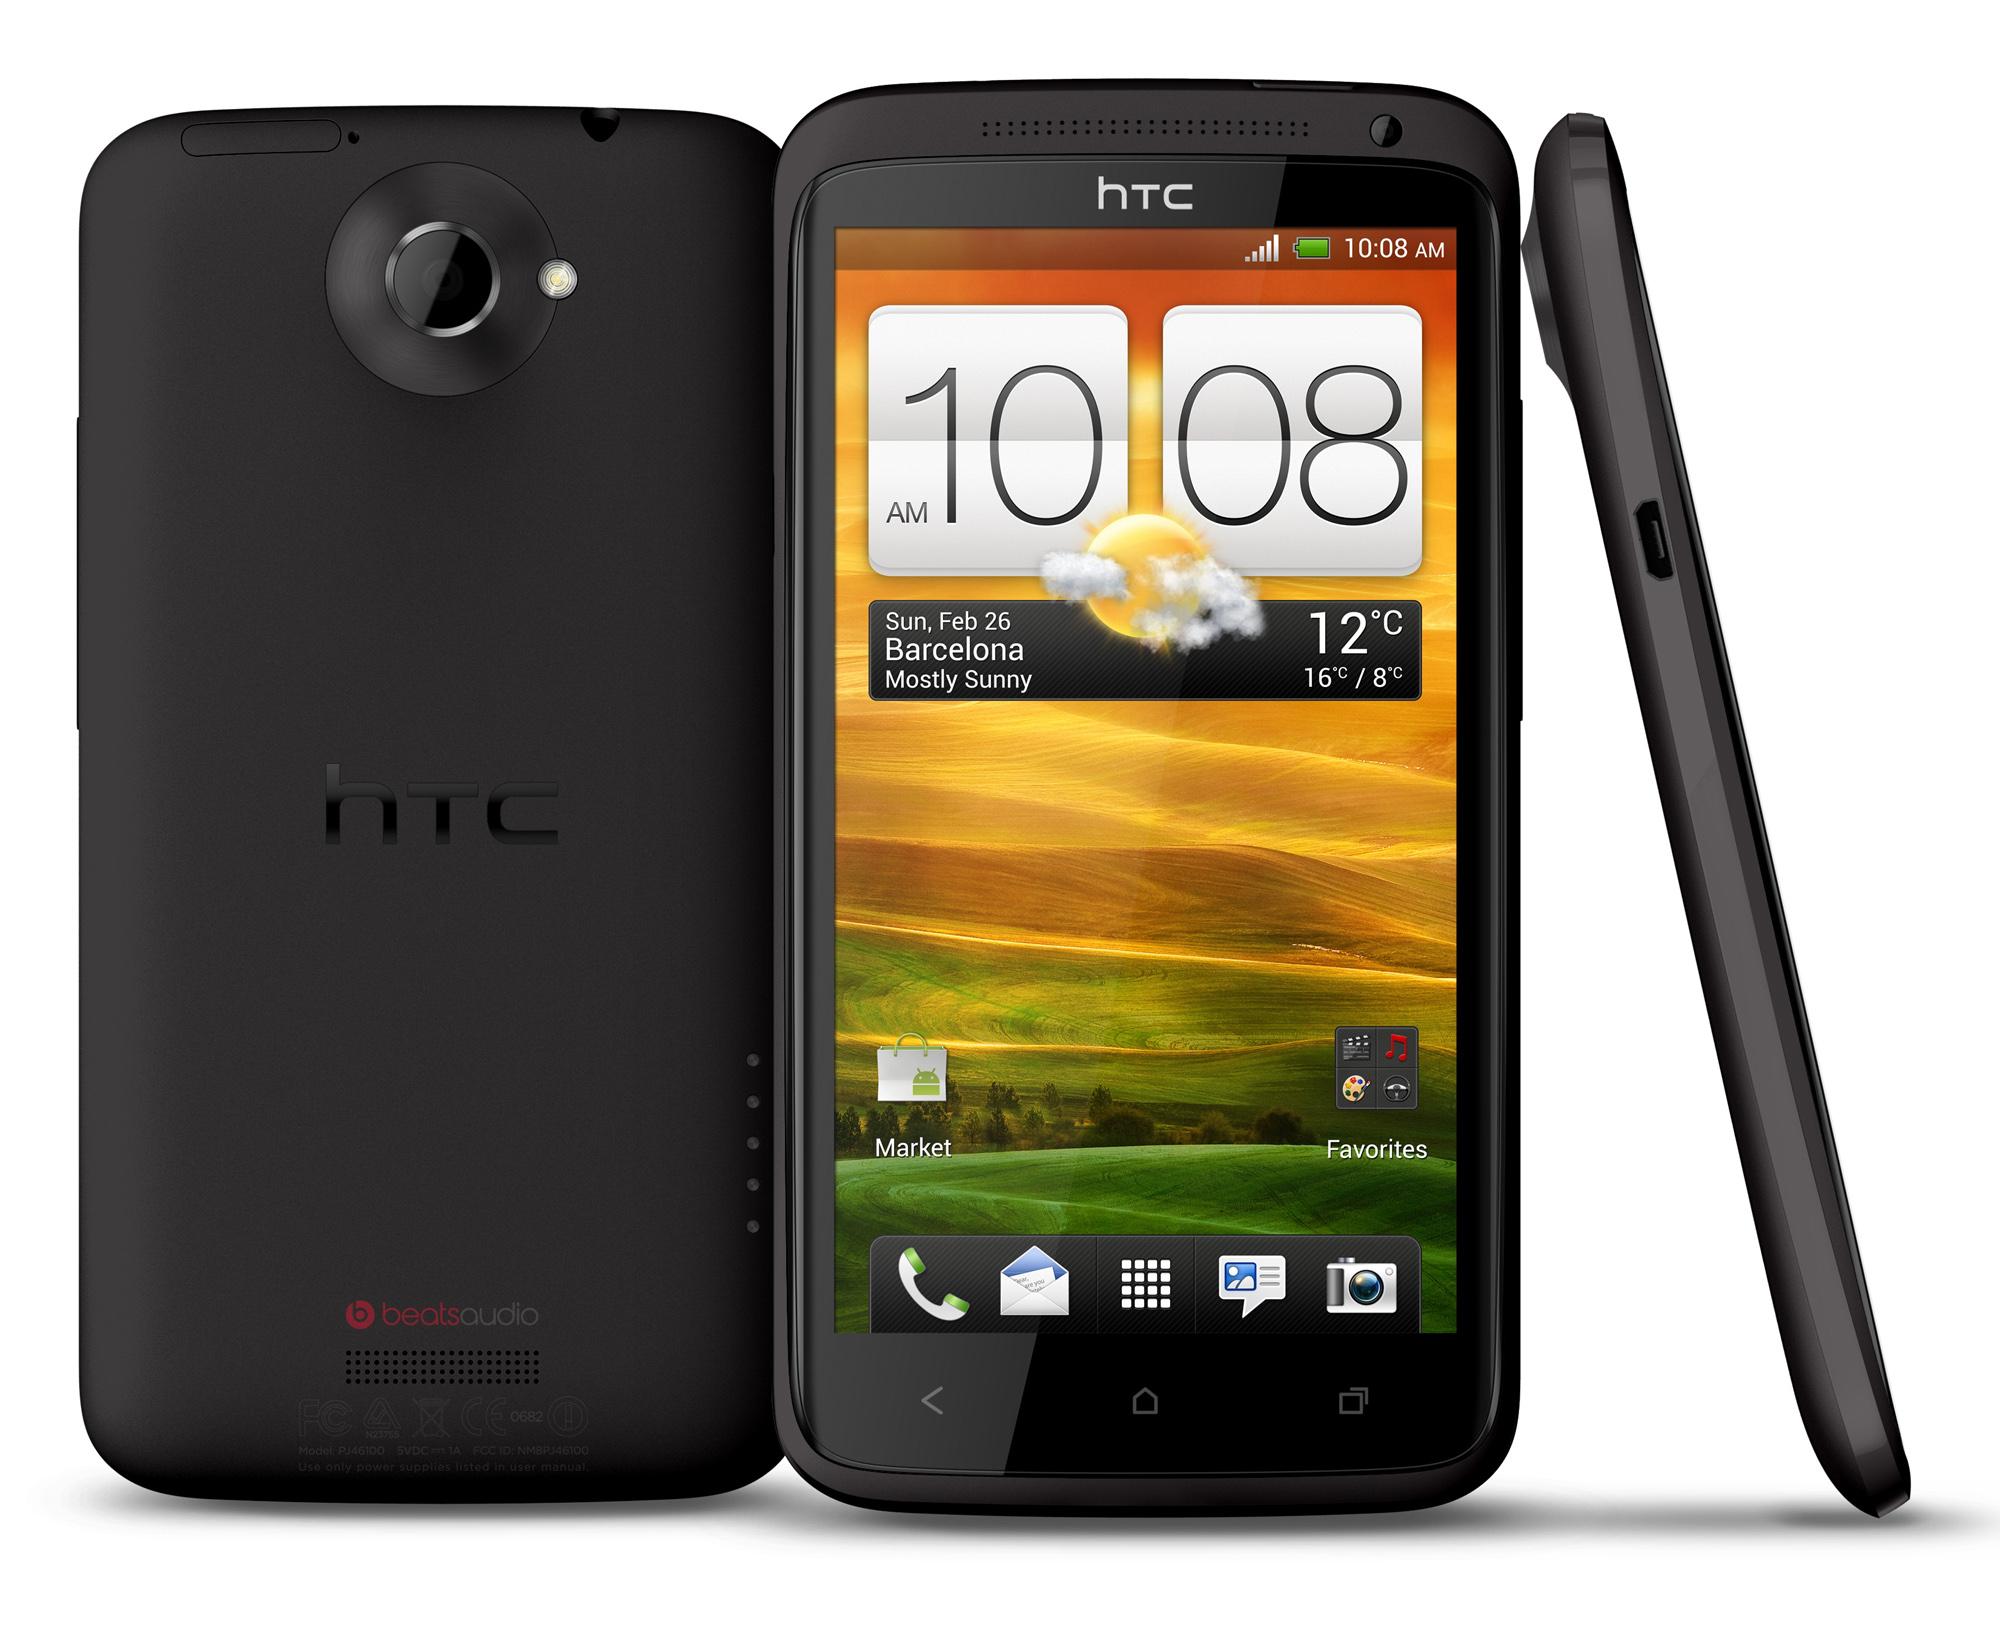 Scarica WhatsApp gratuitamente per HTC One X 1